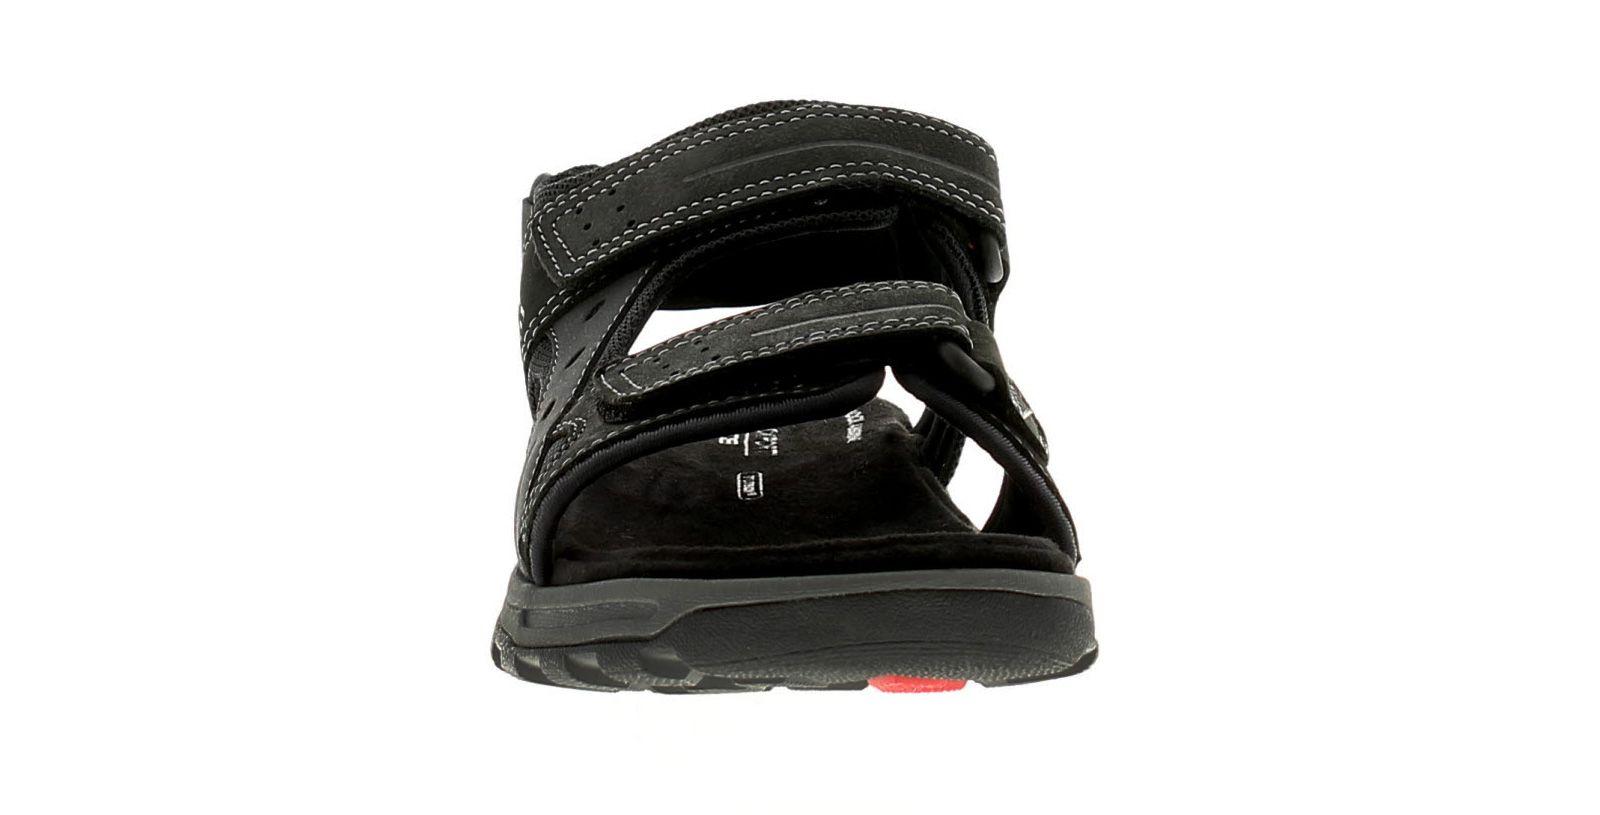 Rockport Trail Technique Mens Casual Beach Sandals Black